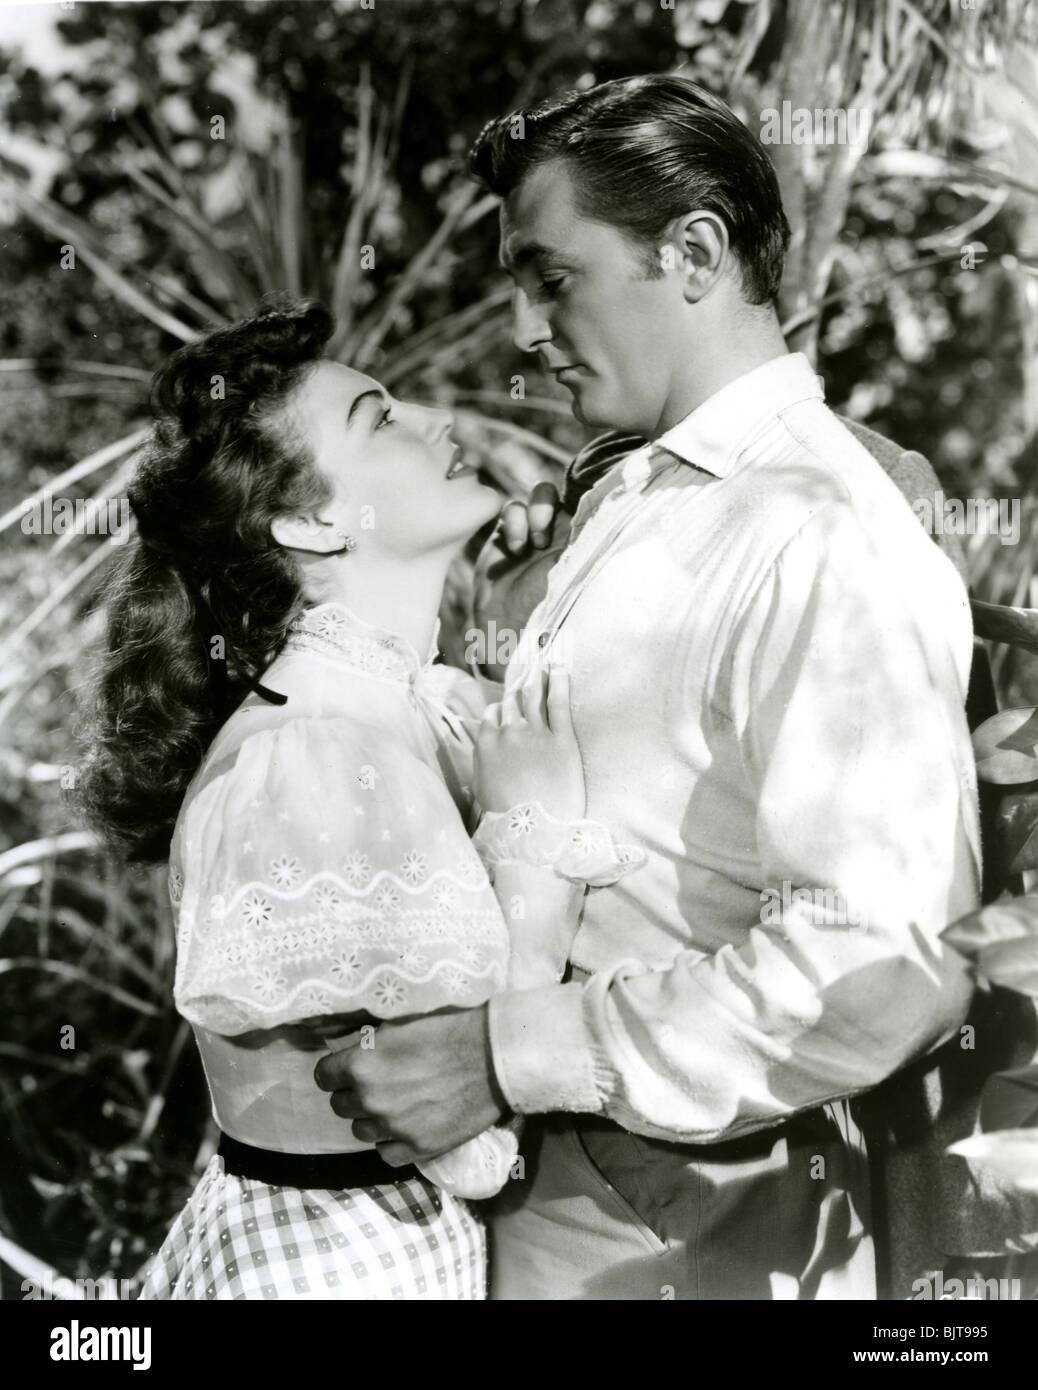 MY FORBIDDEN PAST - 1951 RKO film with Robert Mitchum and Ava Gardner - Stock Image